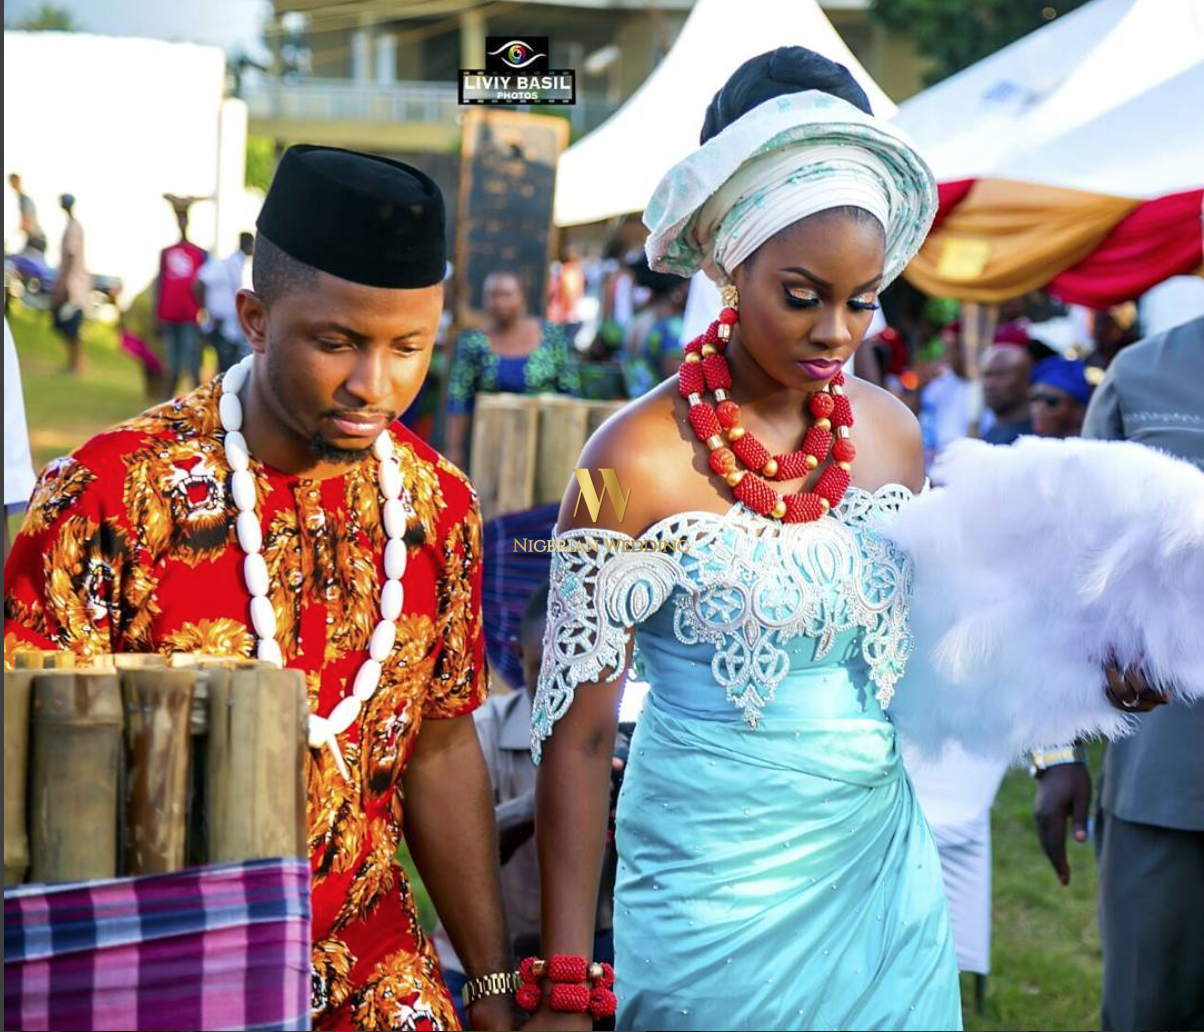 Igbo Nigerian Wedding: #Aidageorge2016! Adaeze & George's Beautiful Igbo